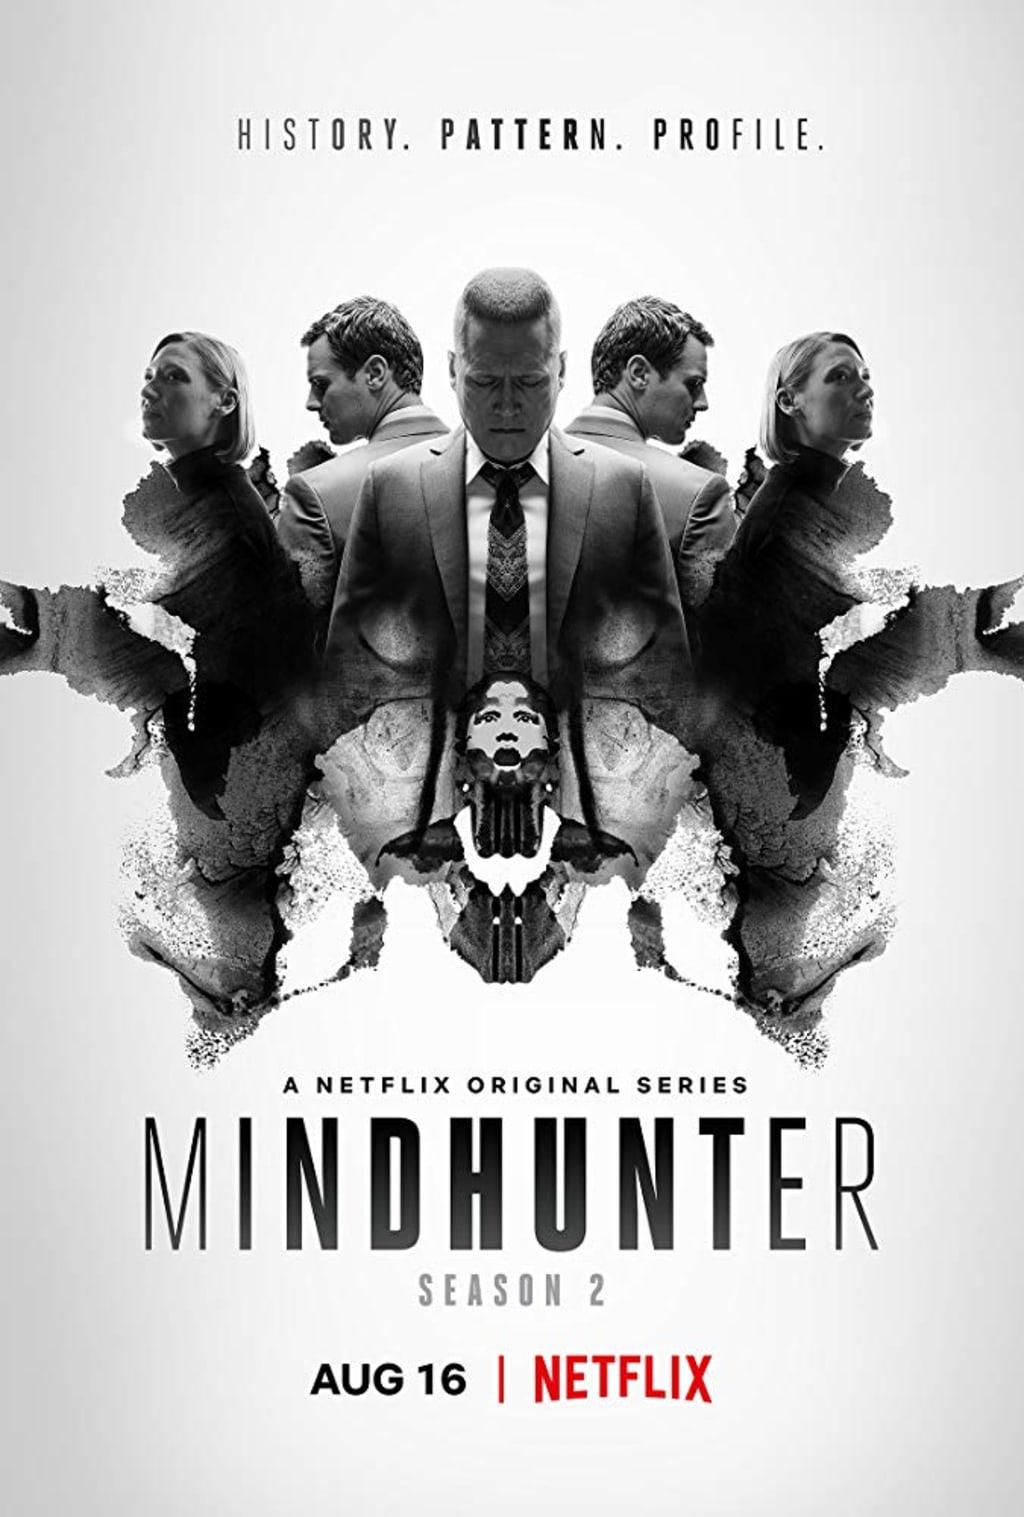 Review of 'Mindhunter' Season 2